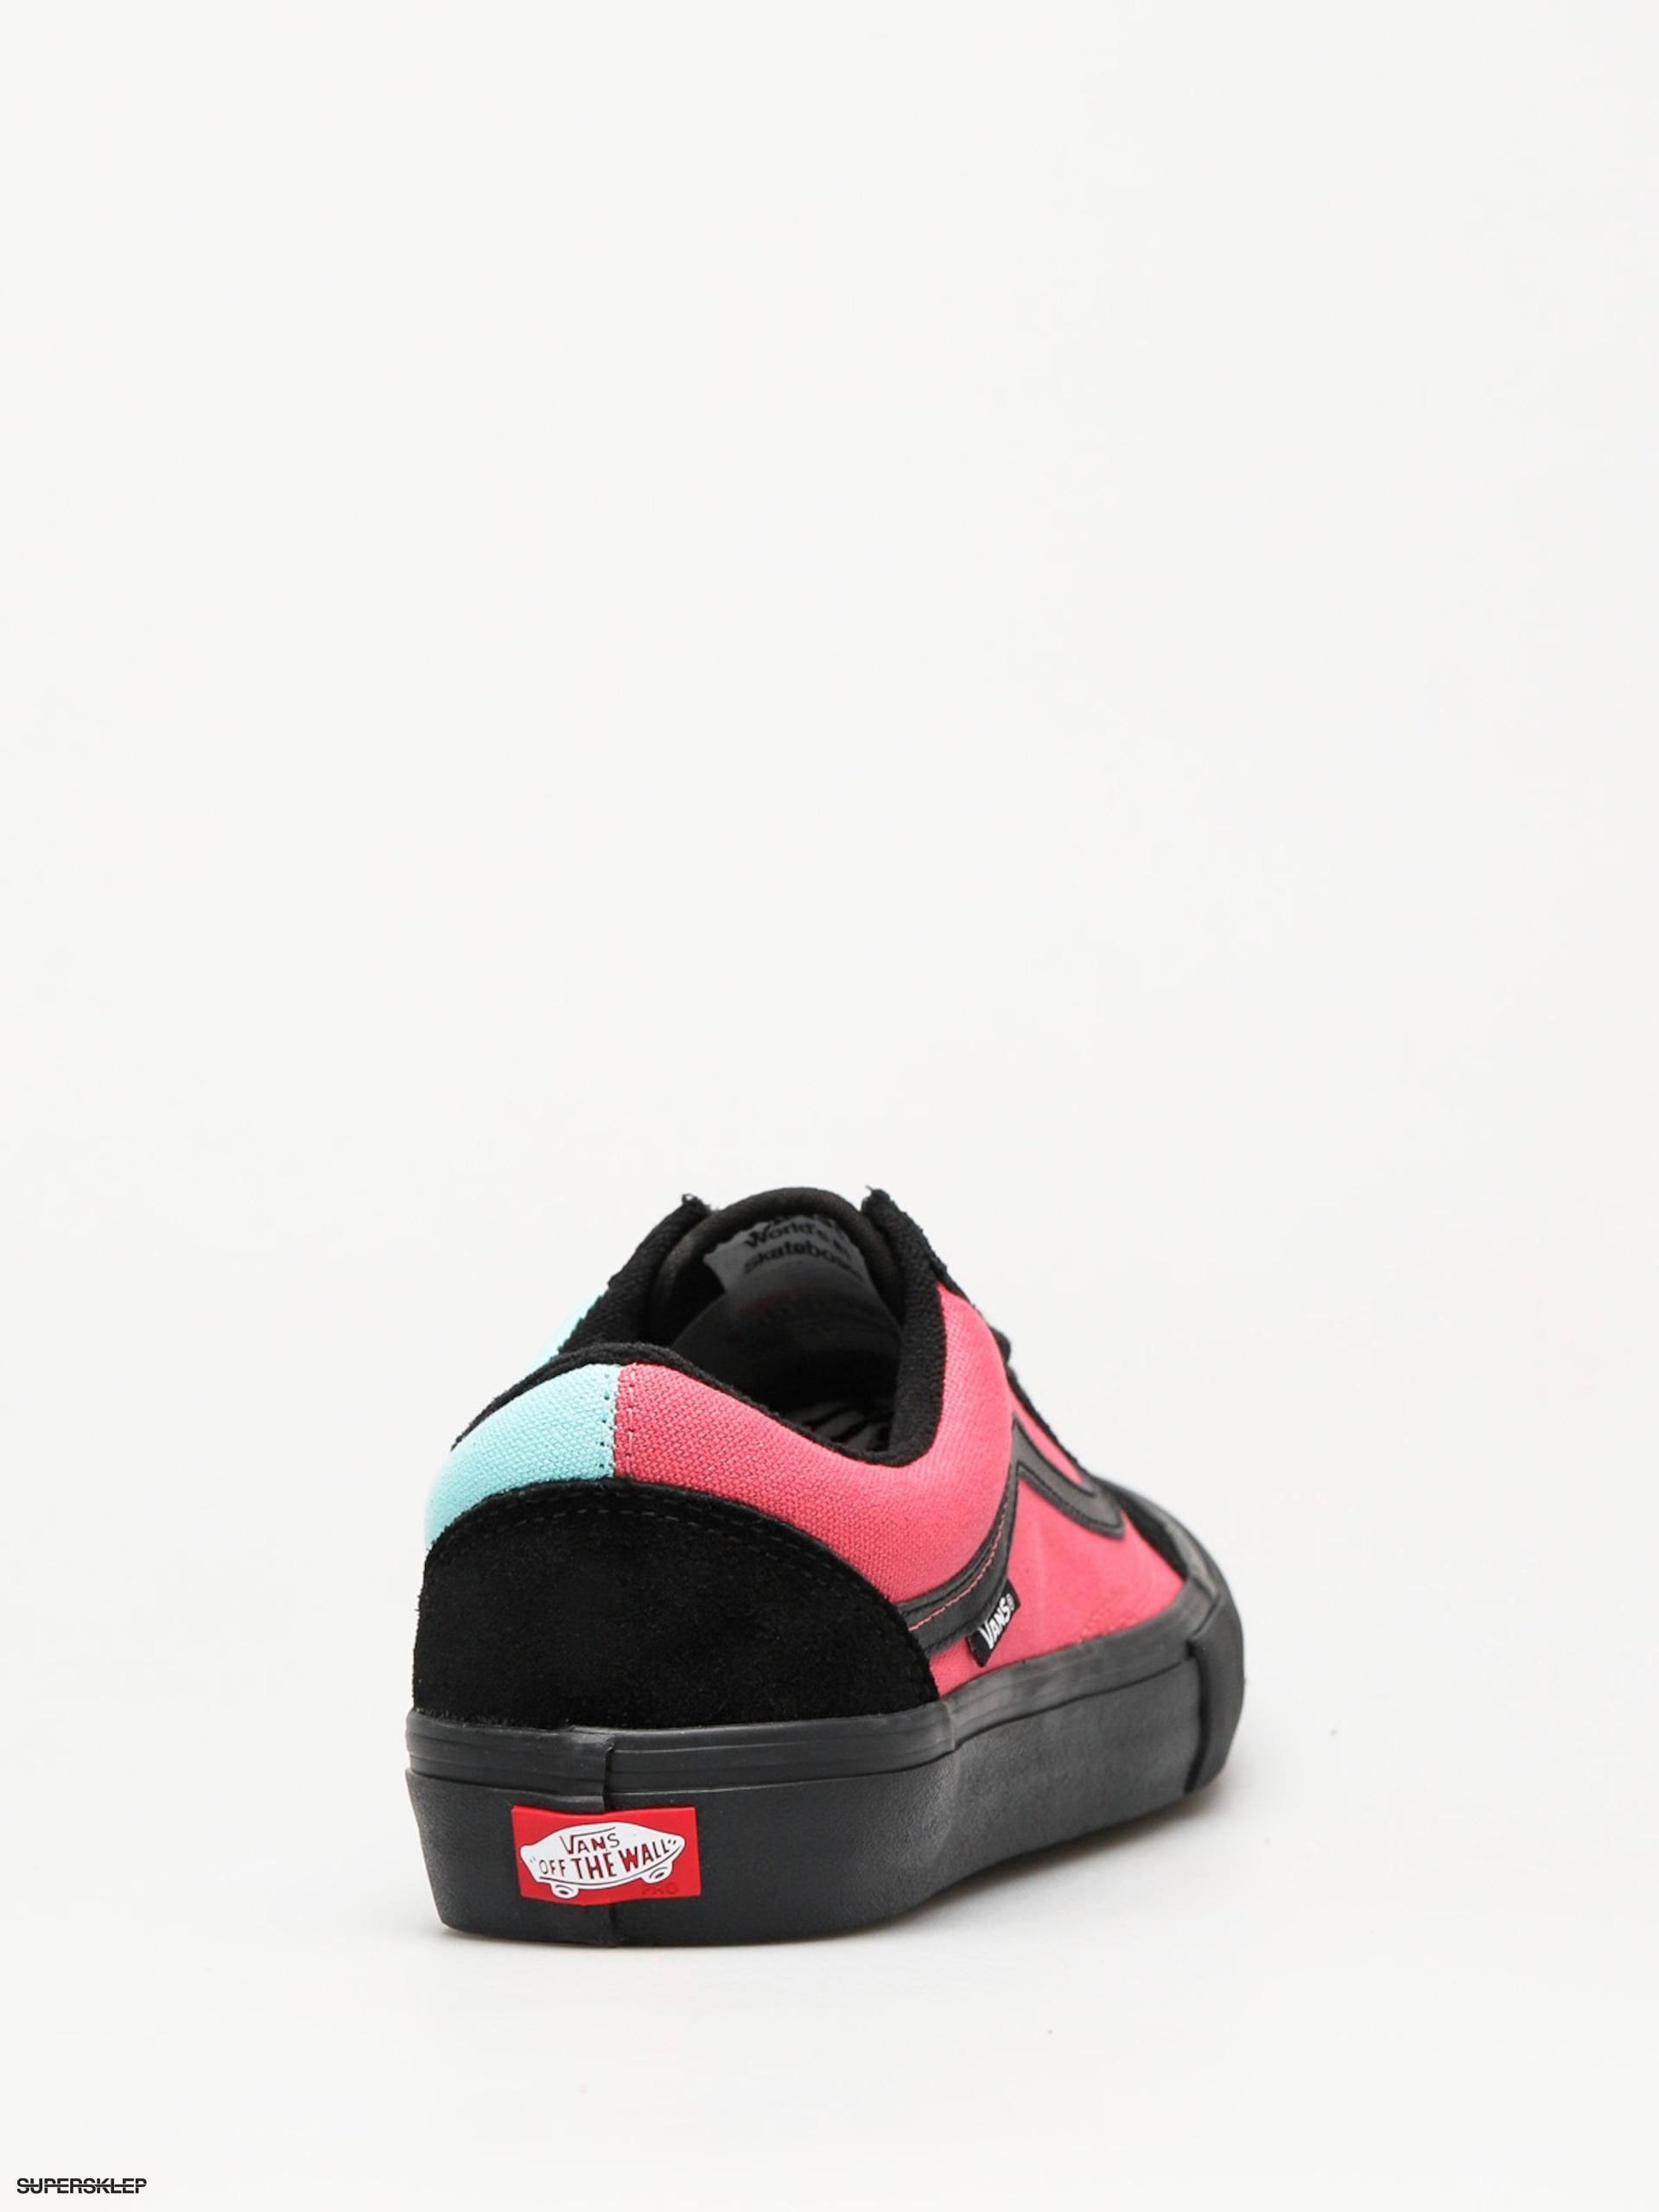 489d459b4f Buty Vans Old Skool Pro (asymmetry black rose blue)